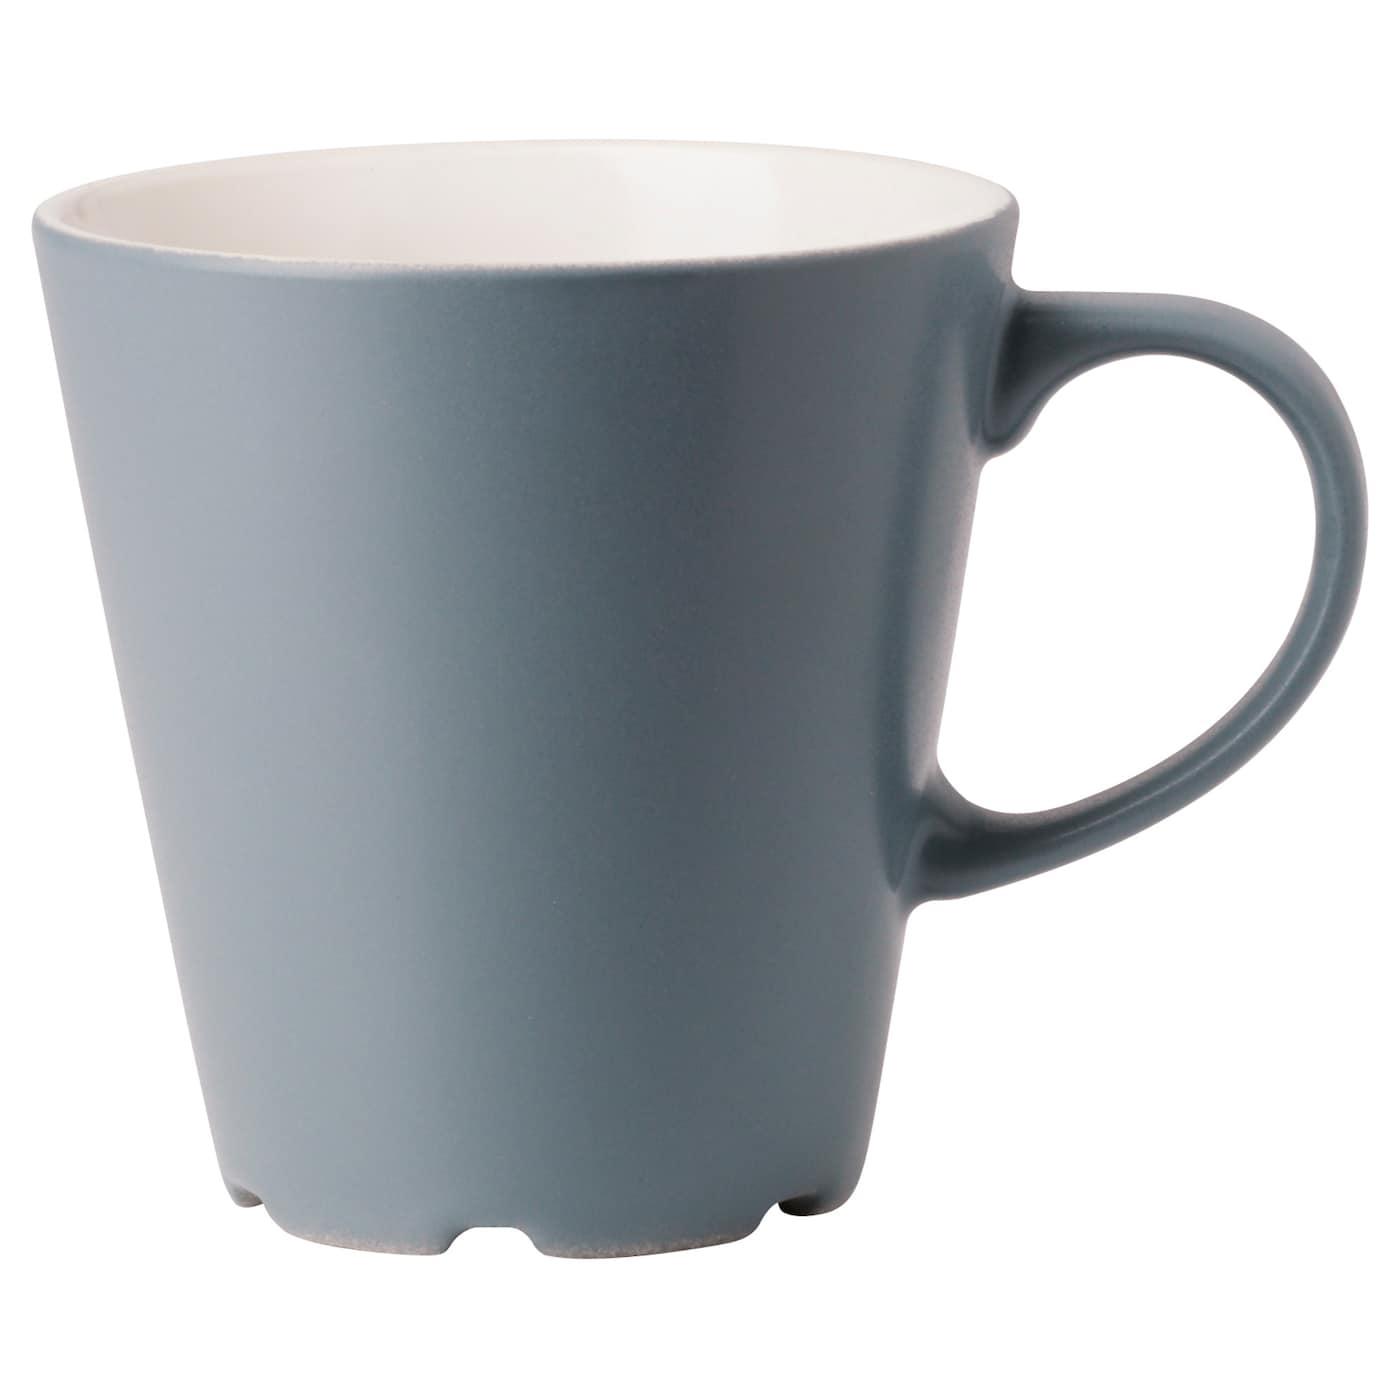 Mugs & cups - Coffee & tea - IKEA